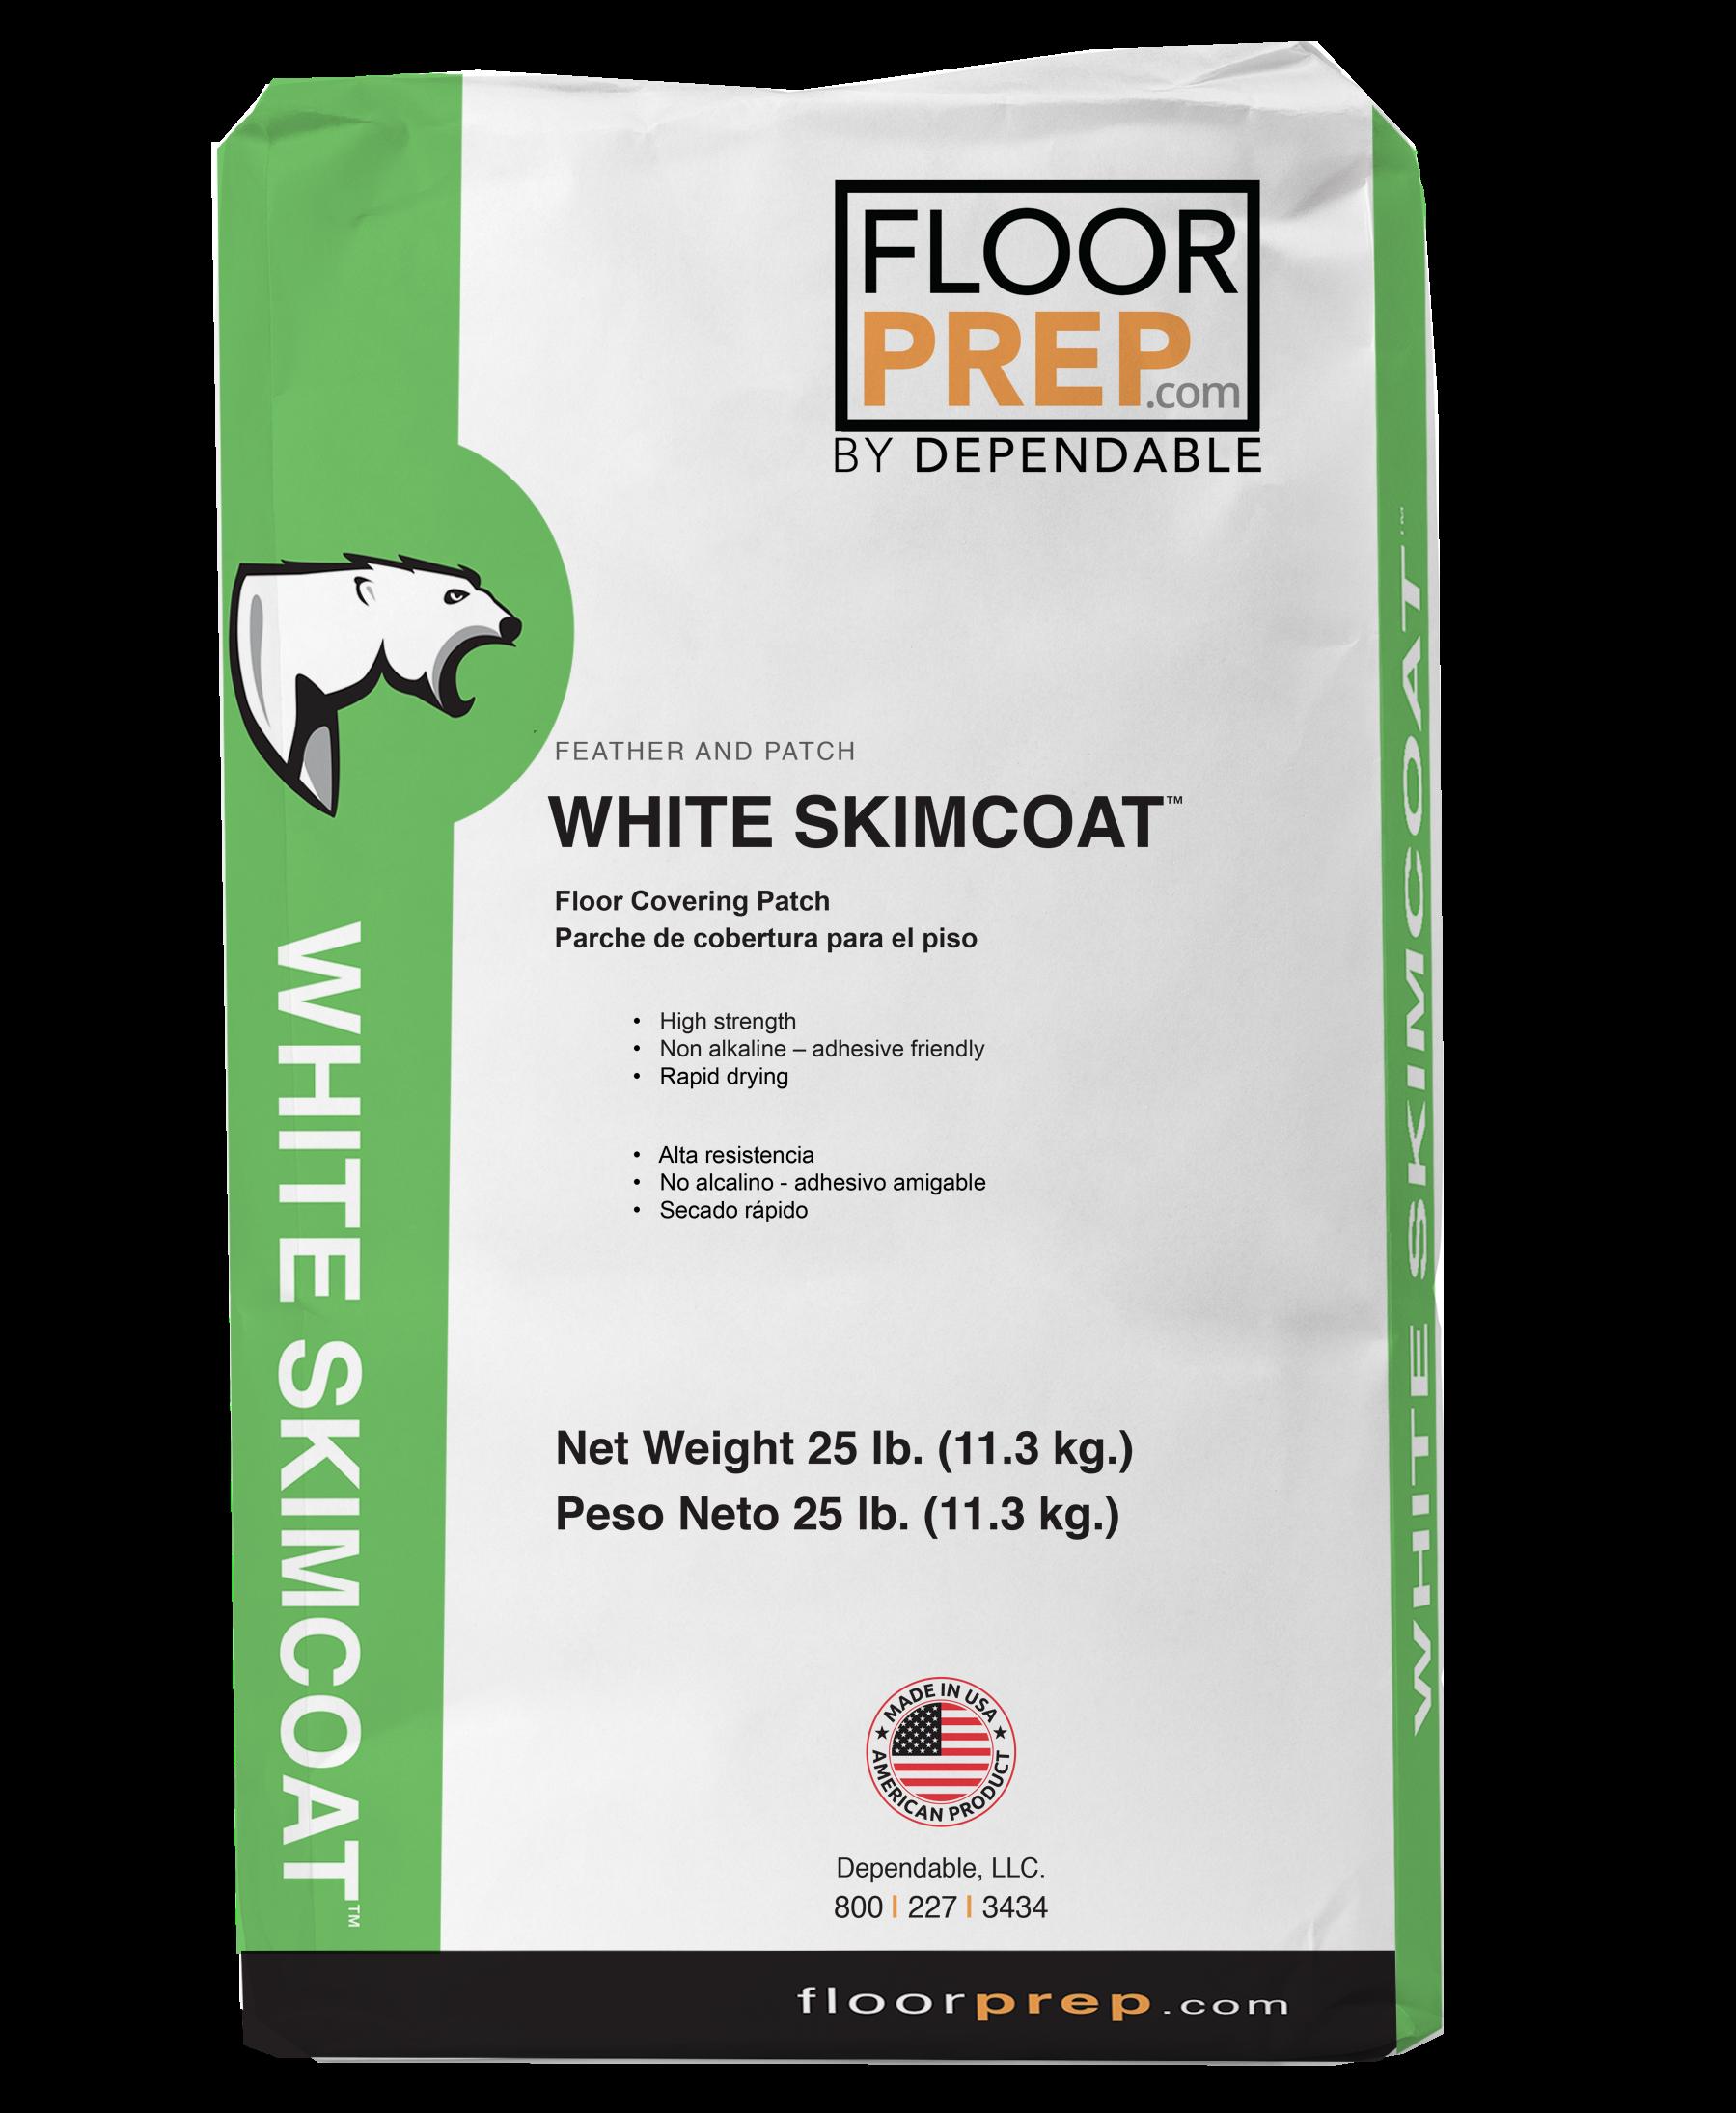 white skimcoat